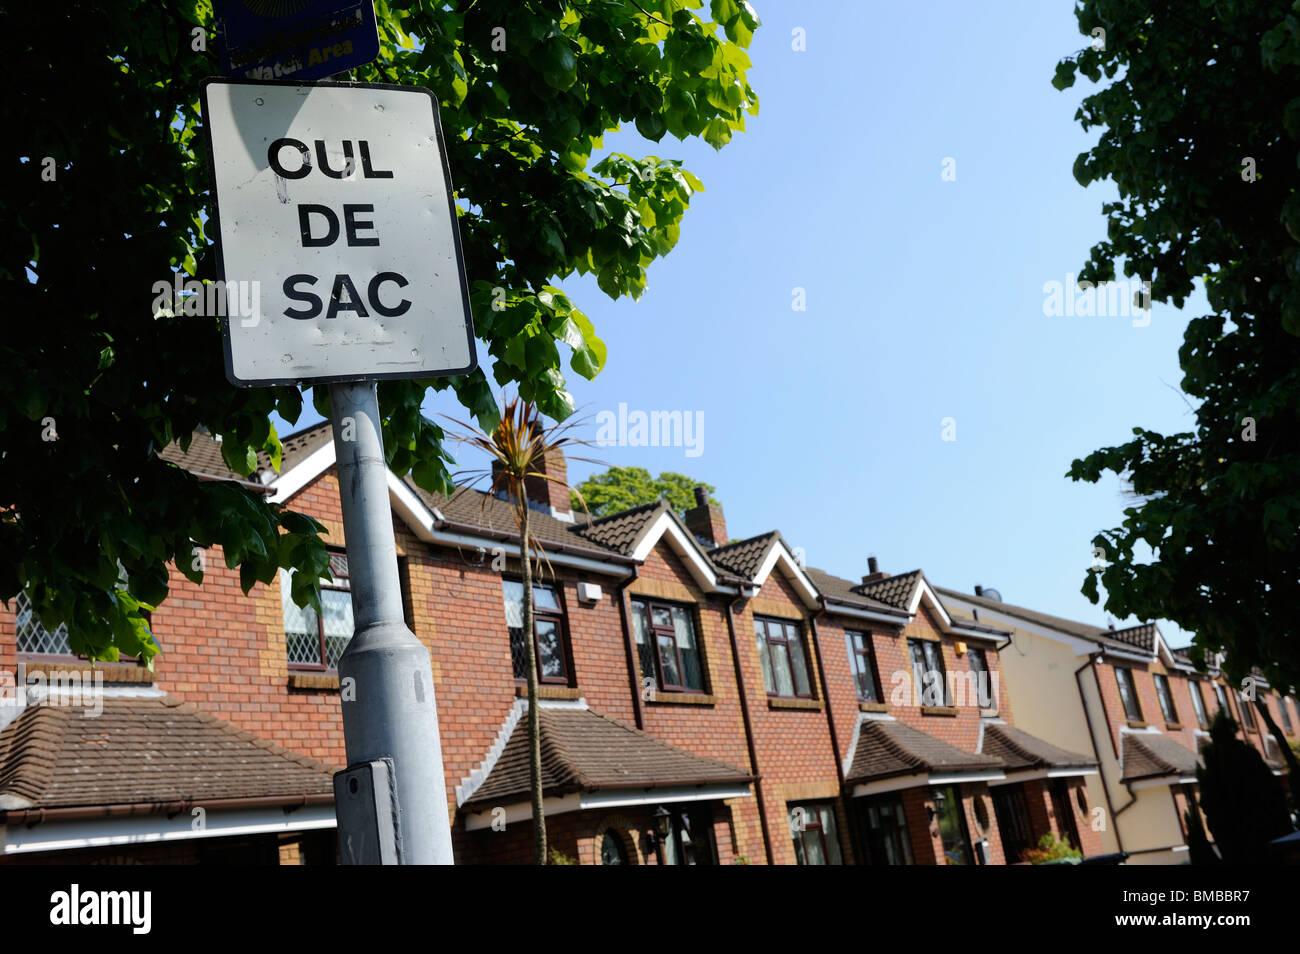 Cul de Sac Sign, Dublin suburb, Ireland - Stock Image